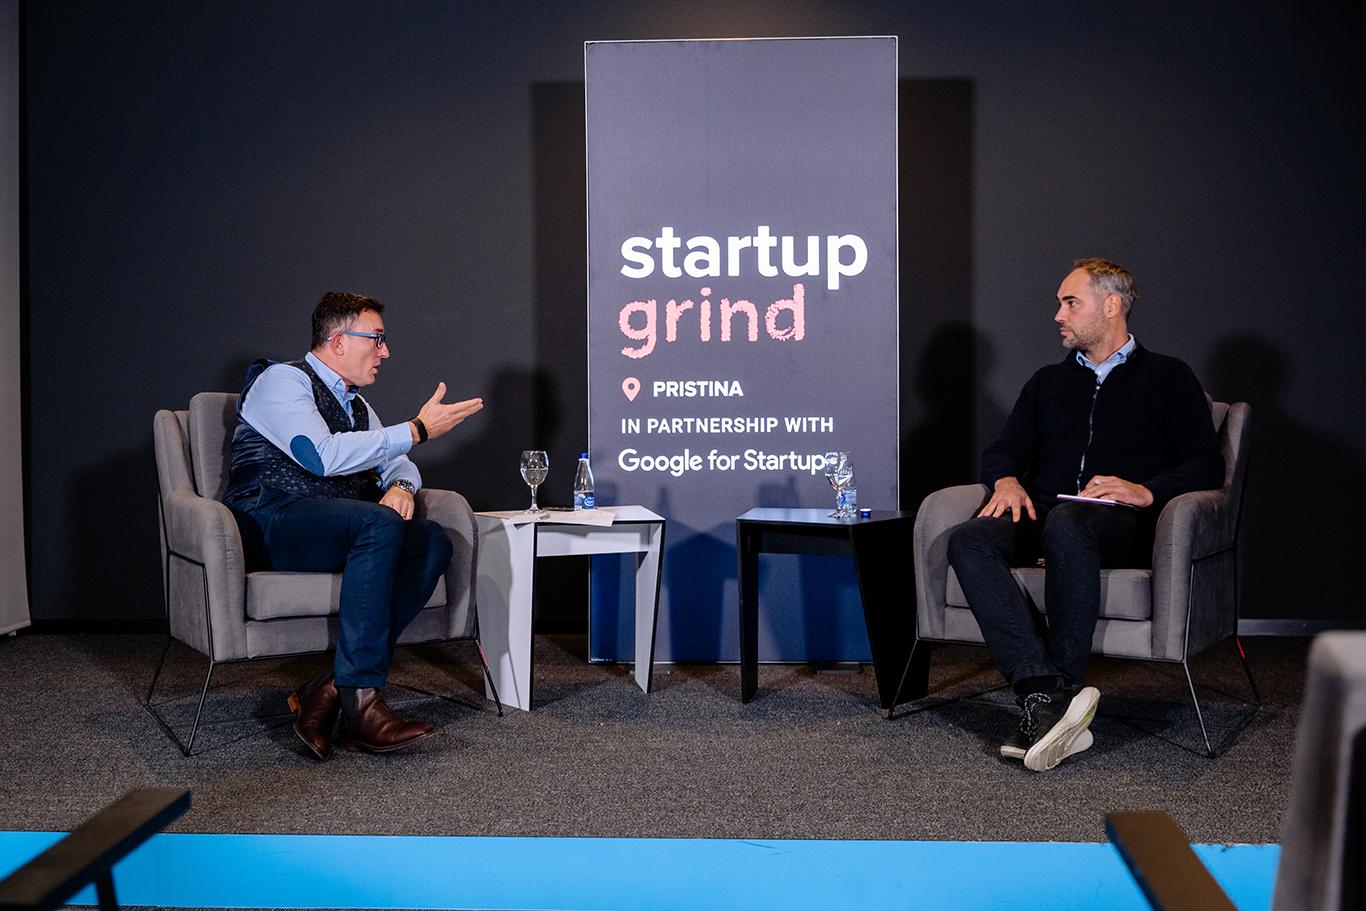 Cashing in Some Knowledge: Startup Grind with Raiffeisen's Shukri Mustafa